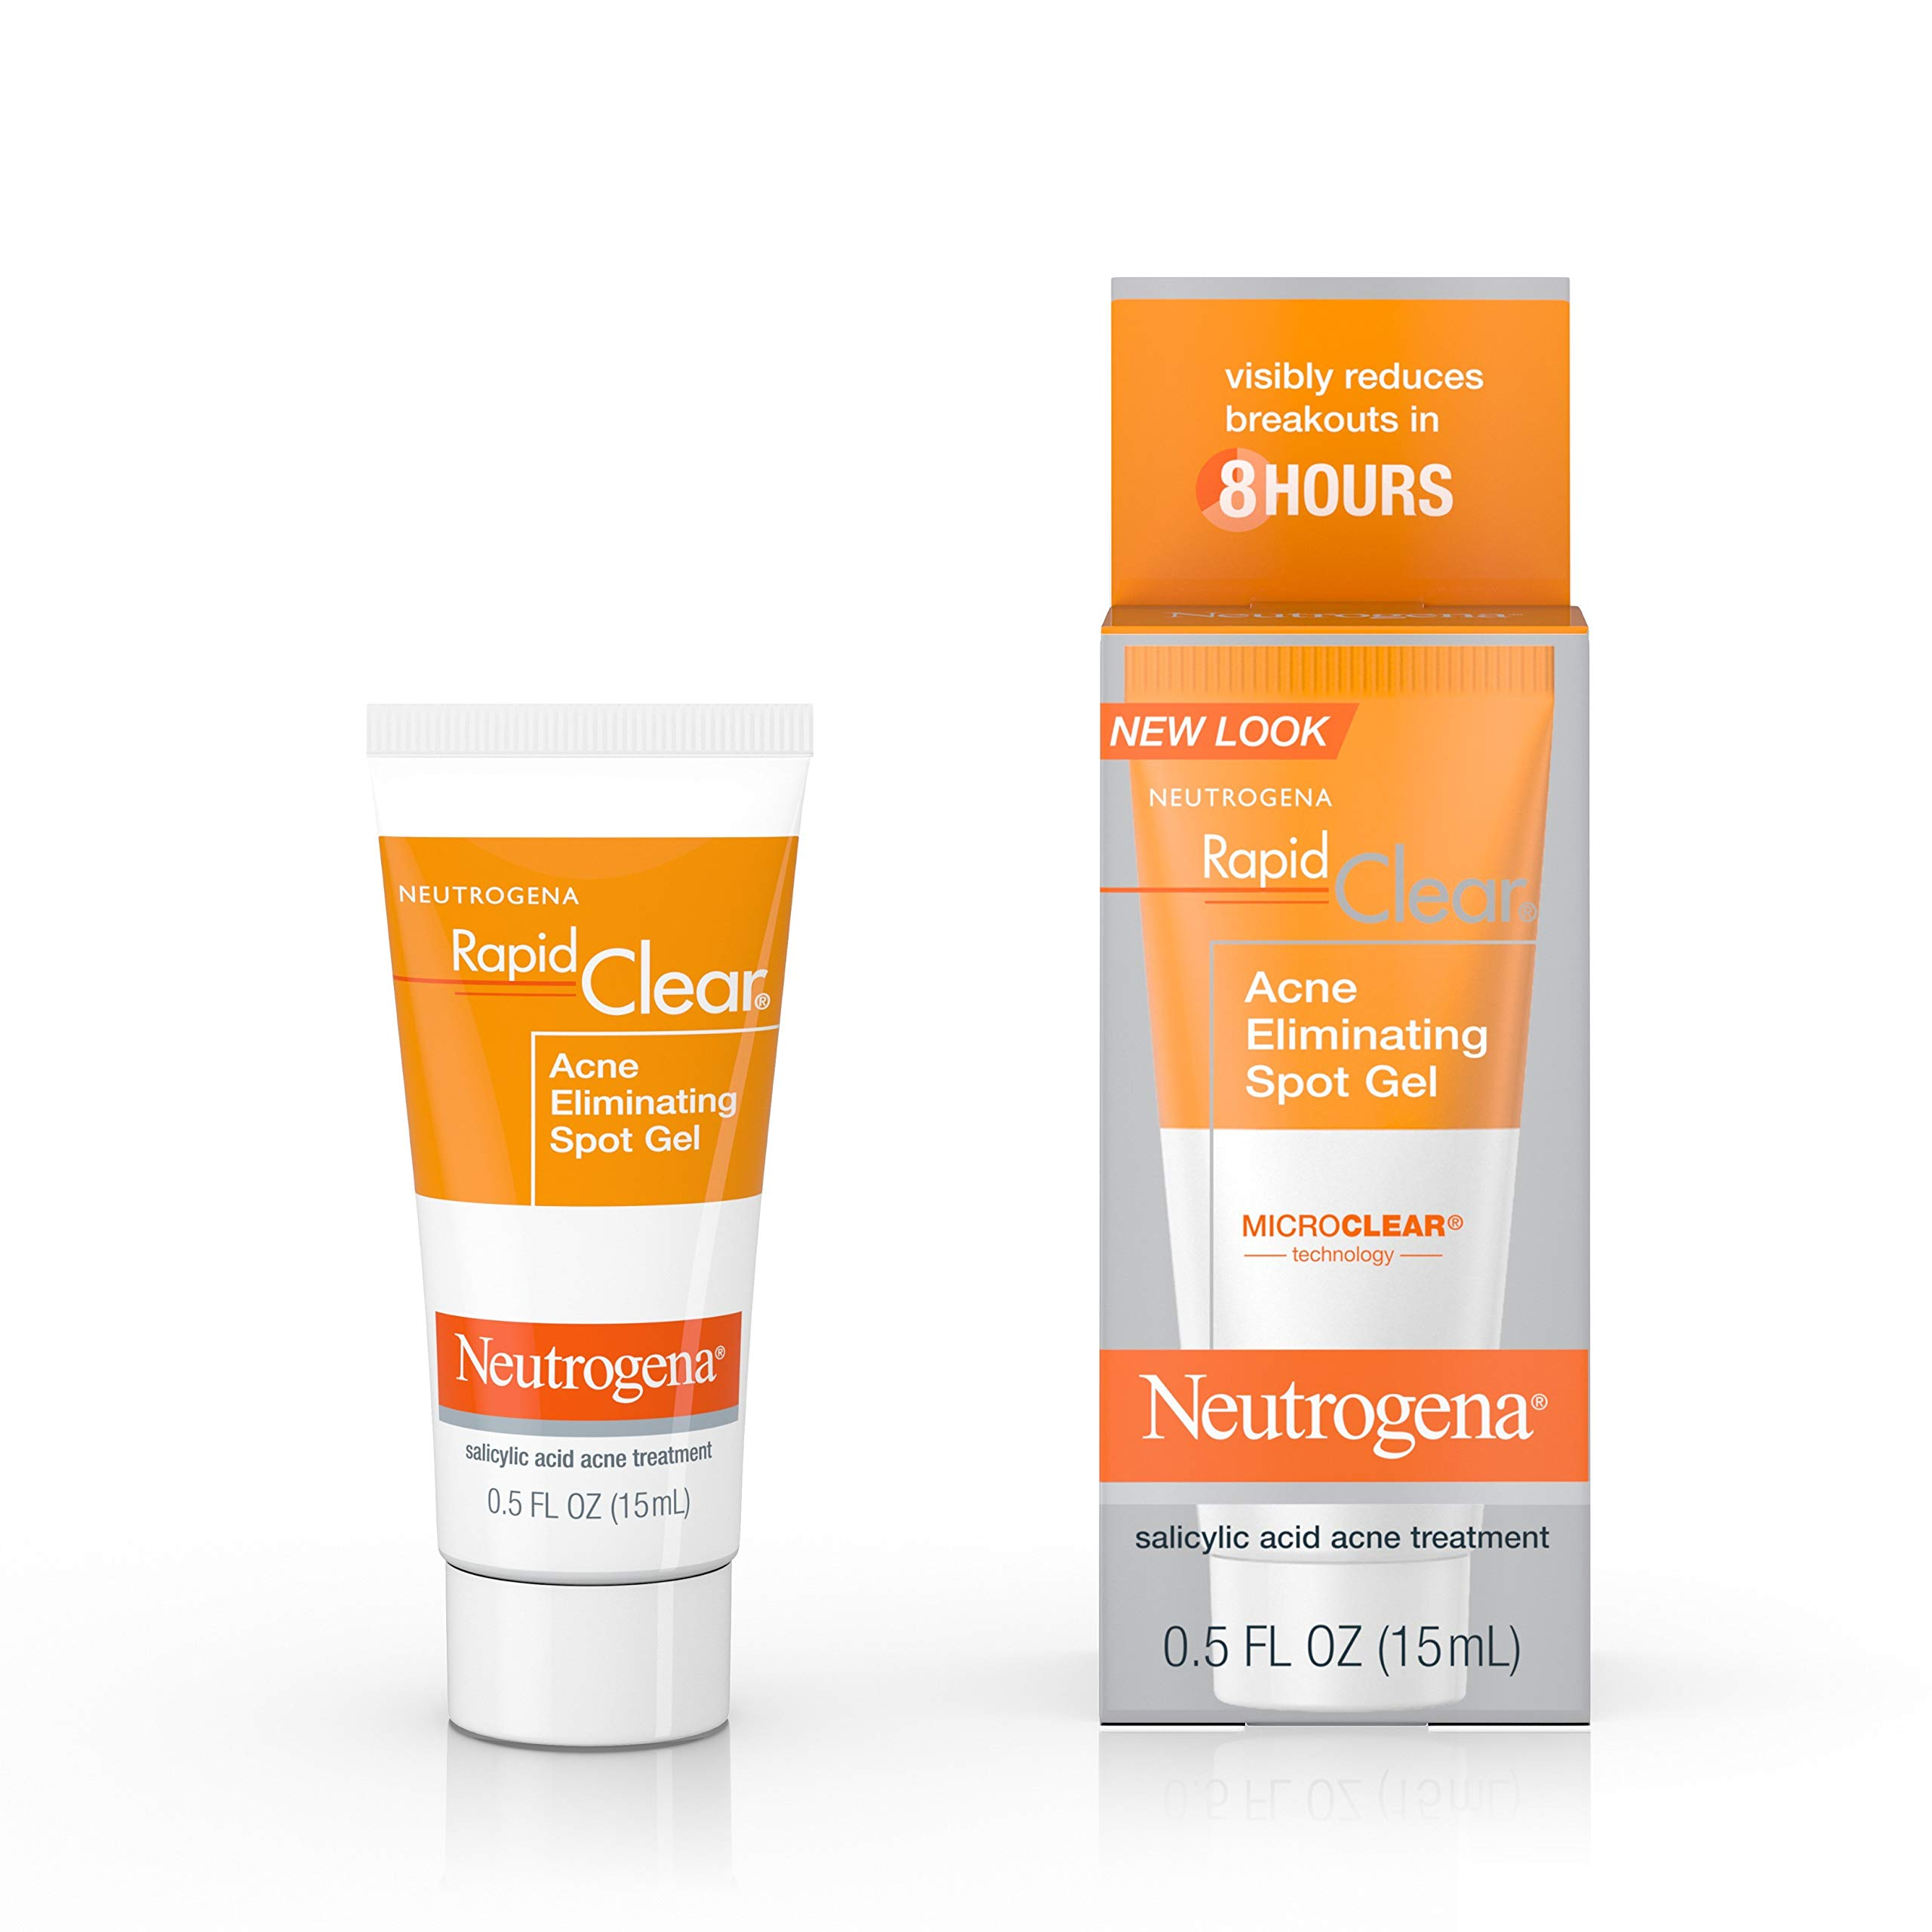 Neutrogena Rapid Clear Acne Eliminating Spot Gel, 0.5 Ounce